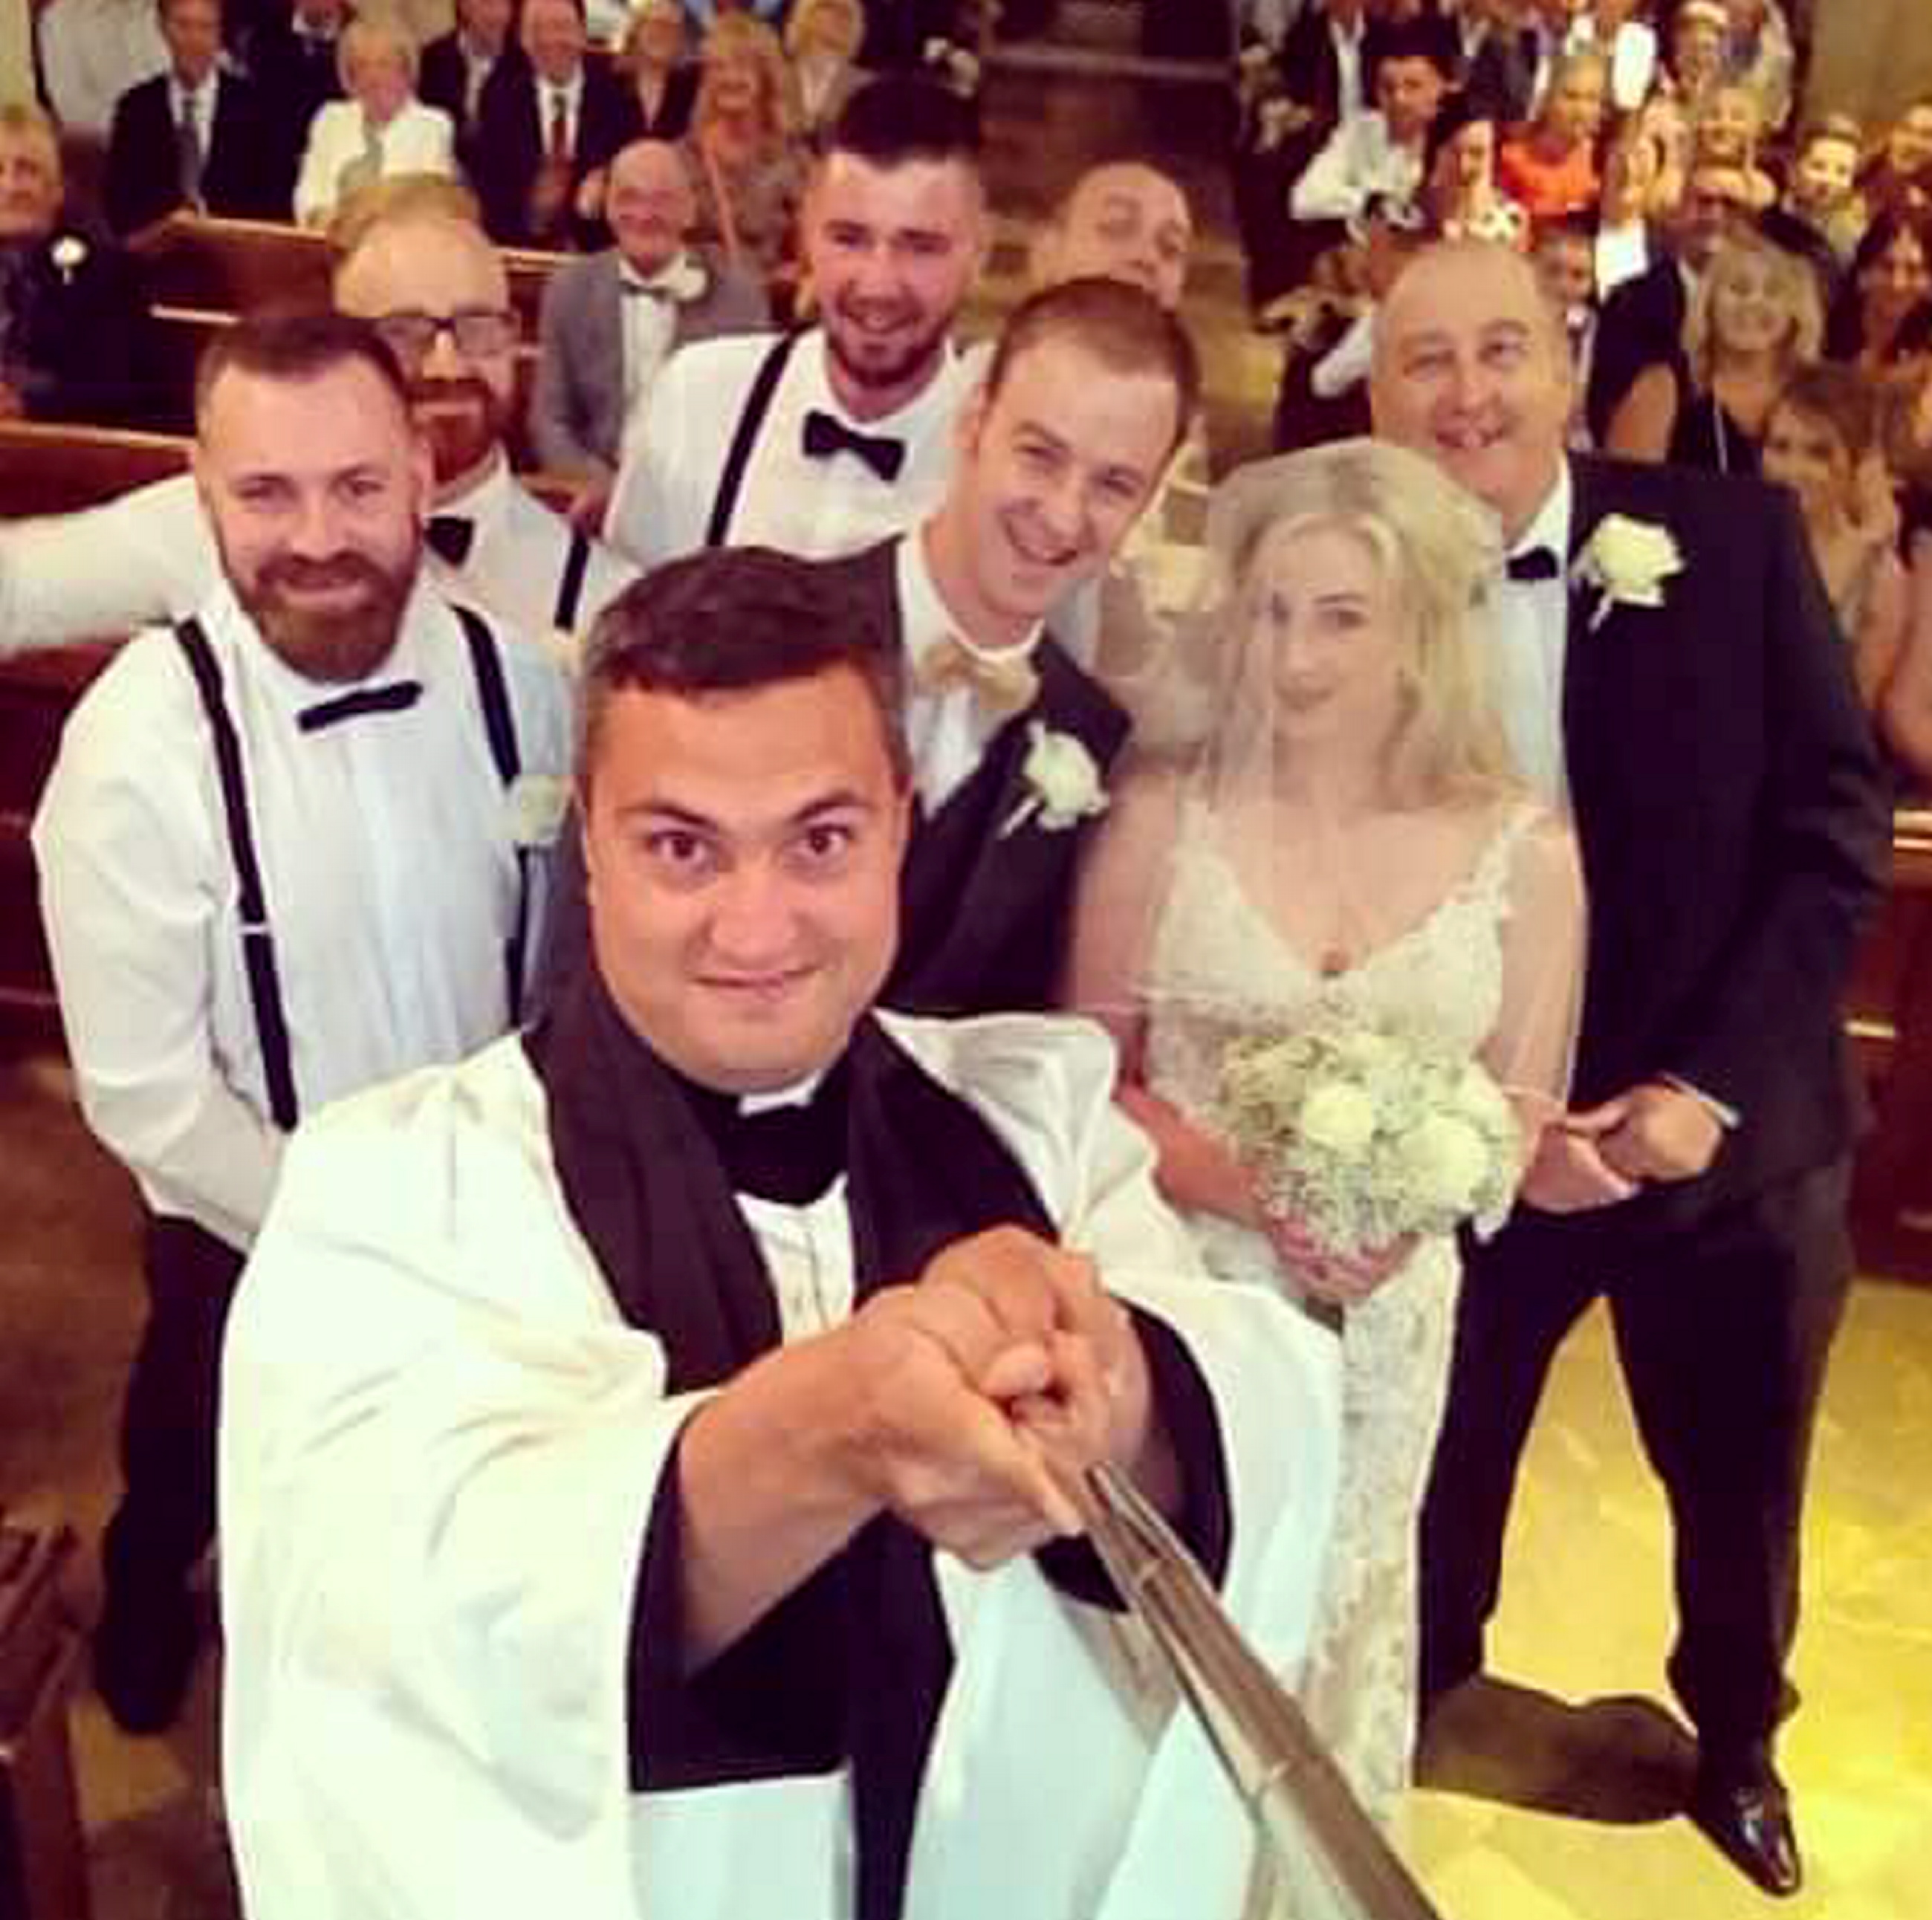 Wedding Altar Selfie